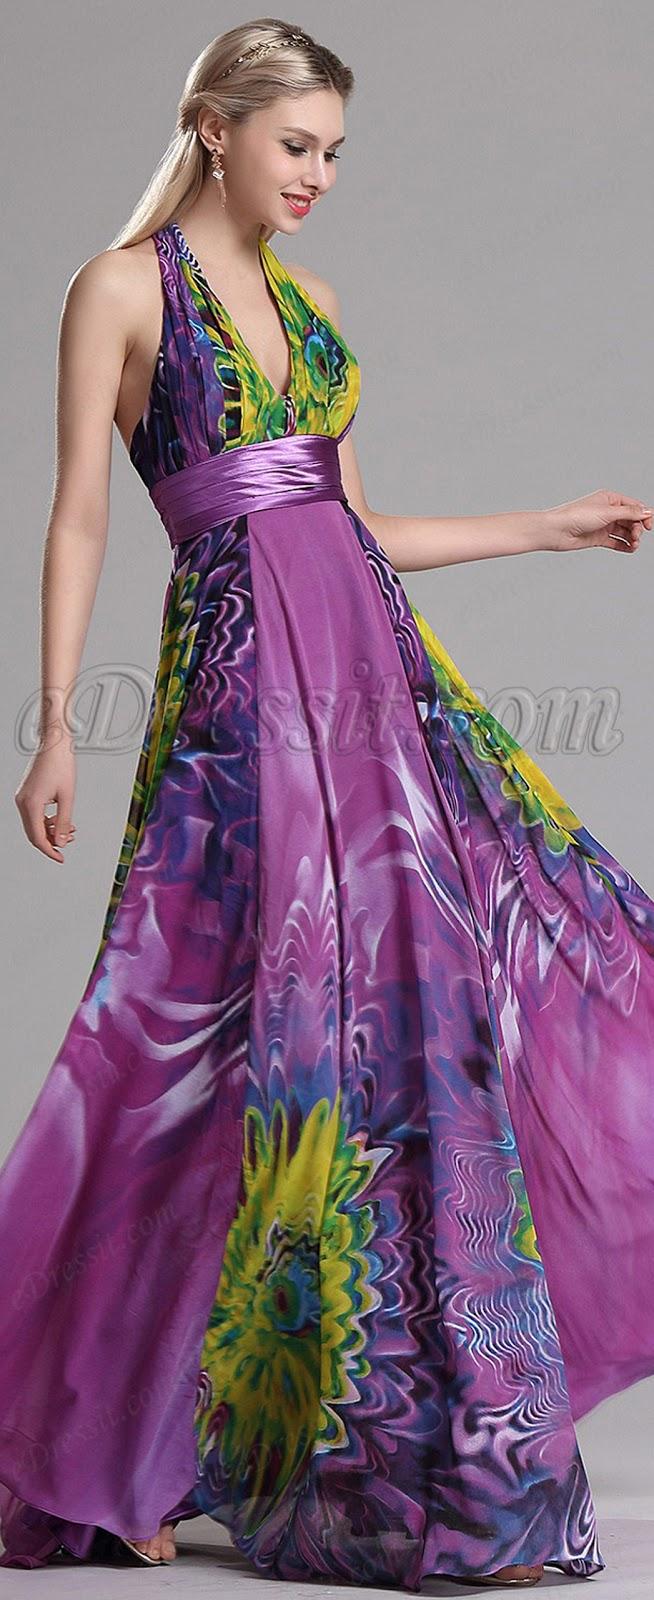 http://www.edressit.com/edressit-halter-plunging-floral-a-line-prom-evening-dress-x07158012-_p4653.html